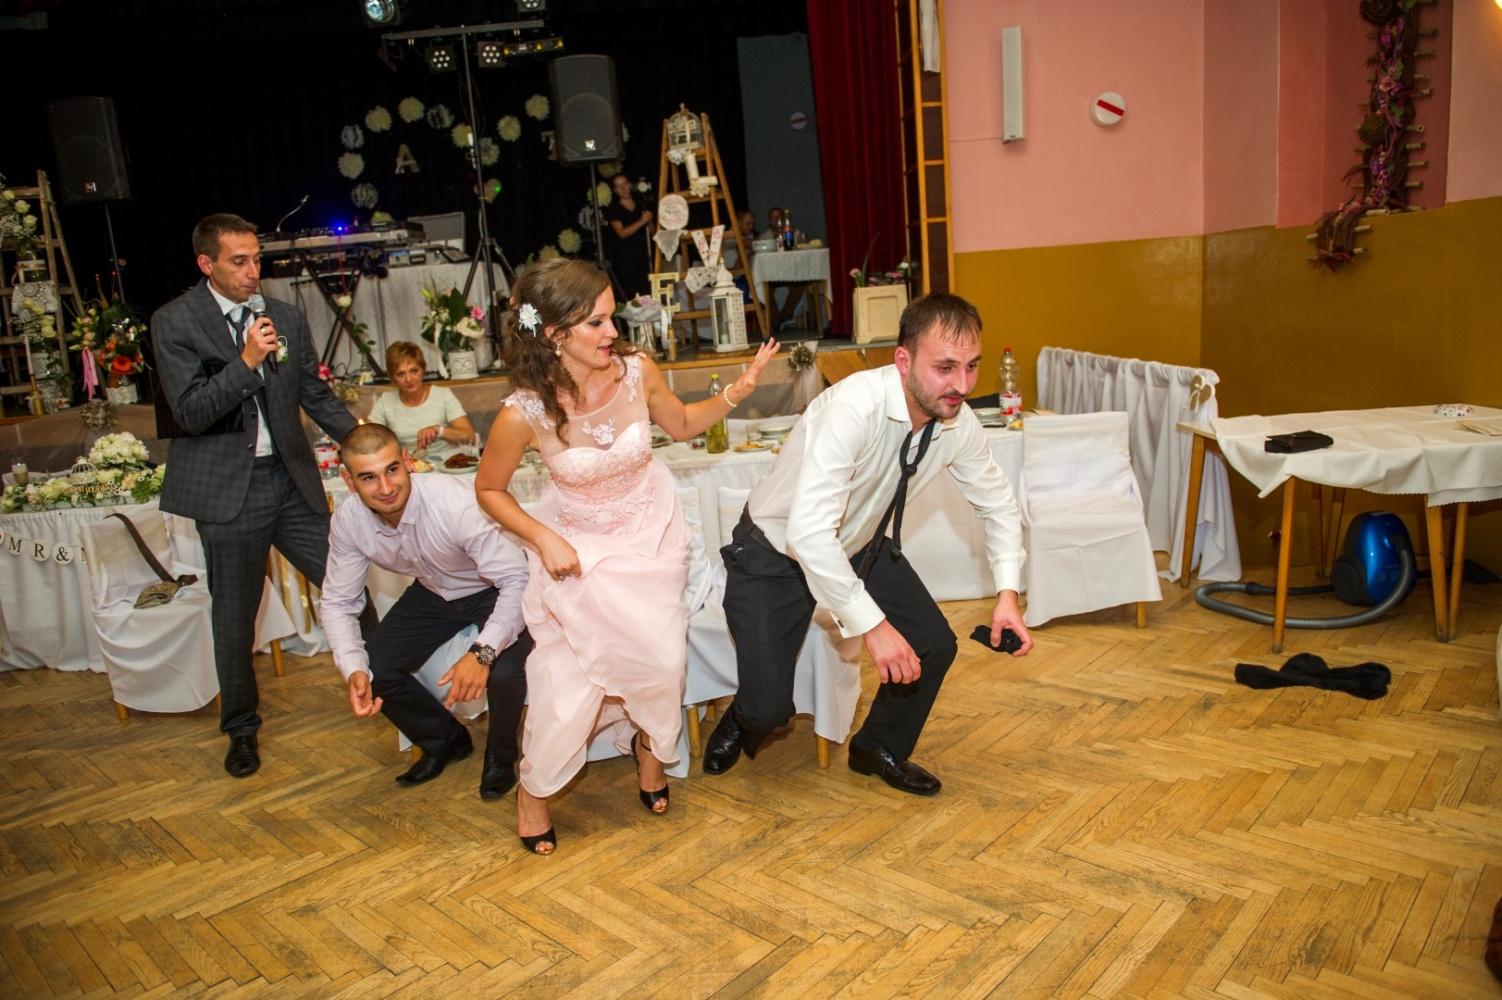 http://www.fotoz.sk/images/gallery-21/normal/svadobne-fotenie_eskuvoi-fotos_342.jpg